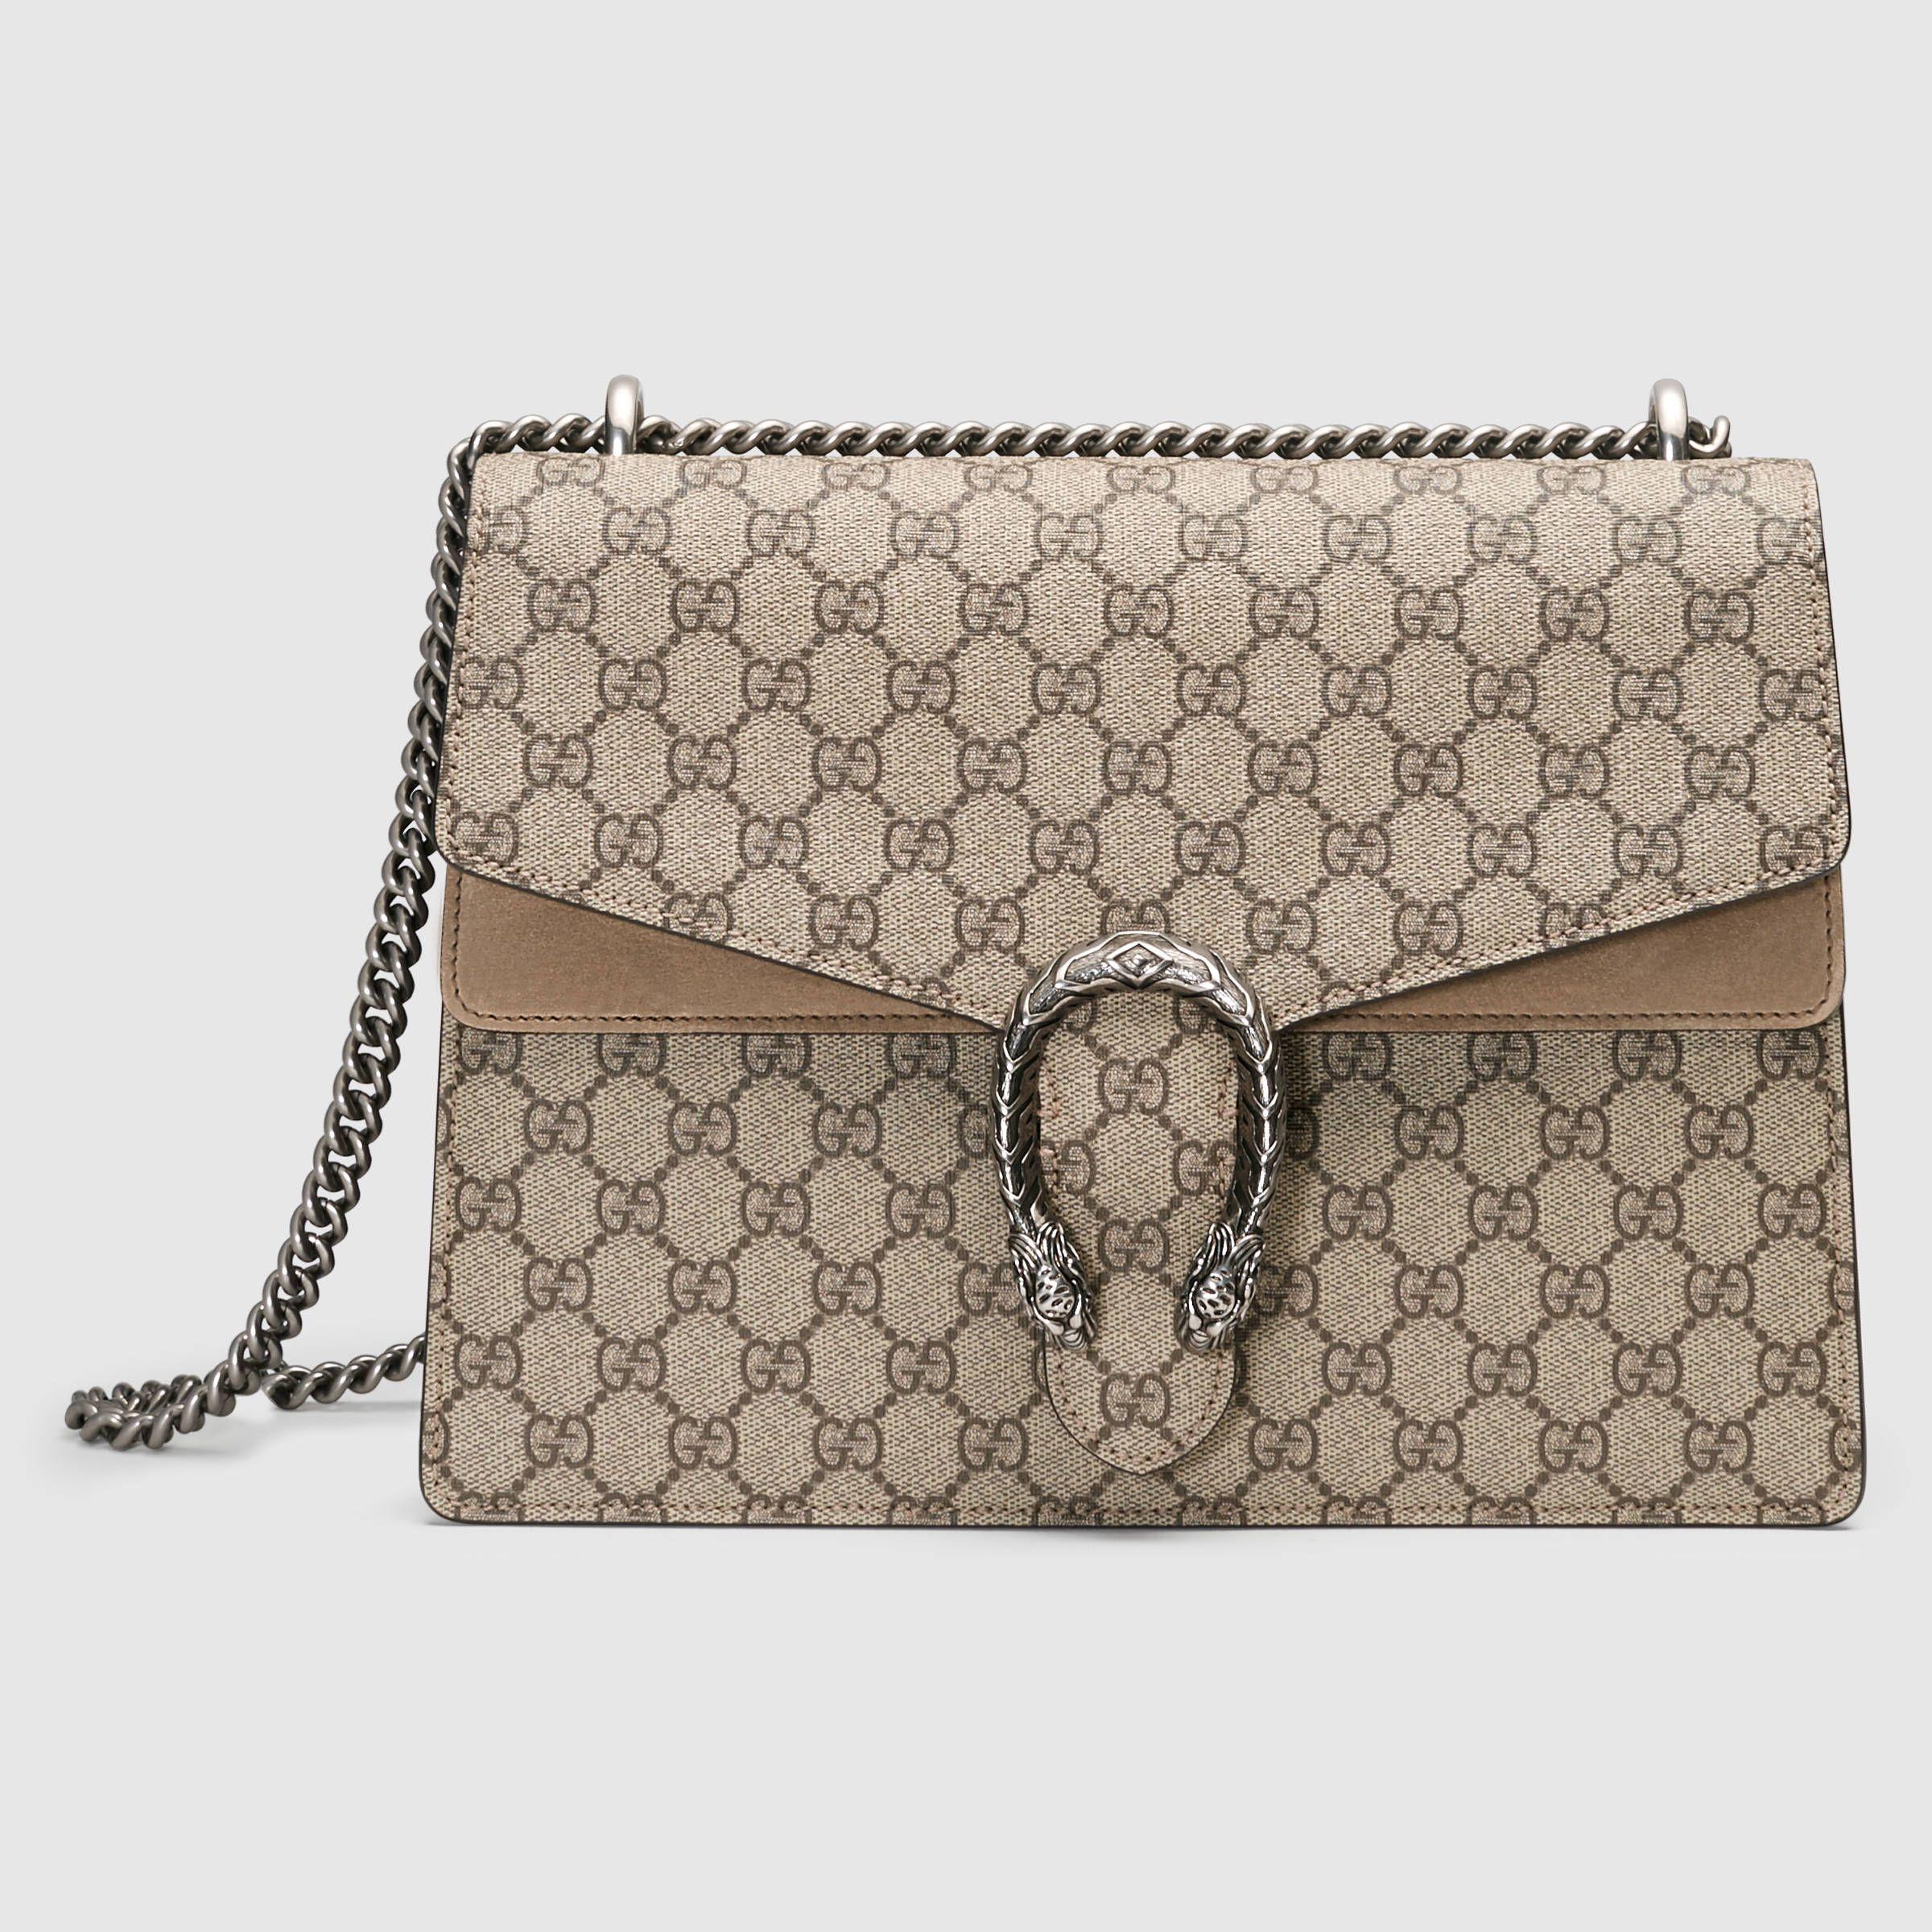 d9d1b8e7fa0 Gucci Women - Gucci Dionysus Beige Ebony GG Supreme Canvas shoulder bag w  taupe suede detail -  2